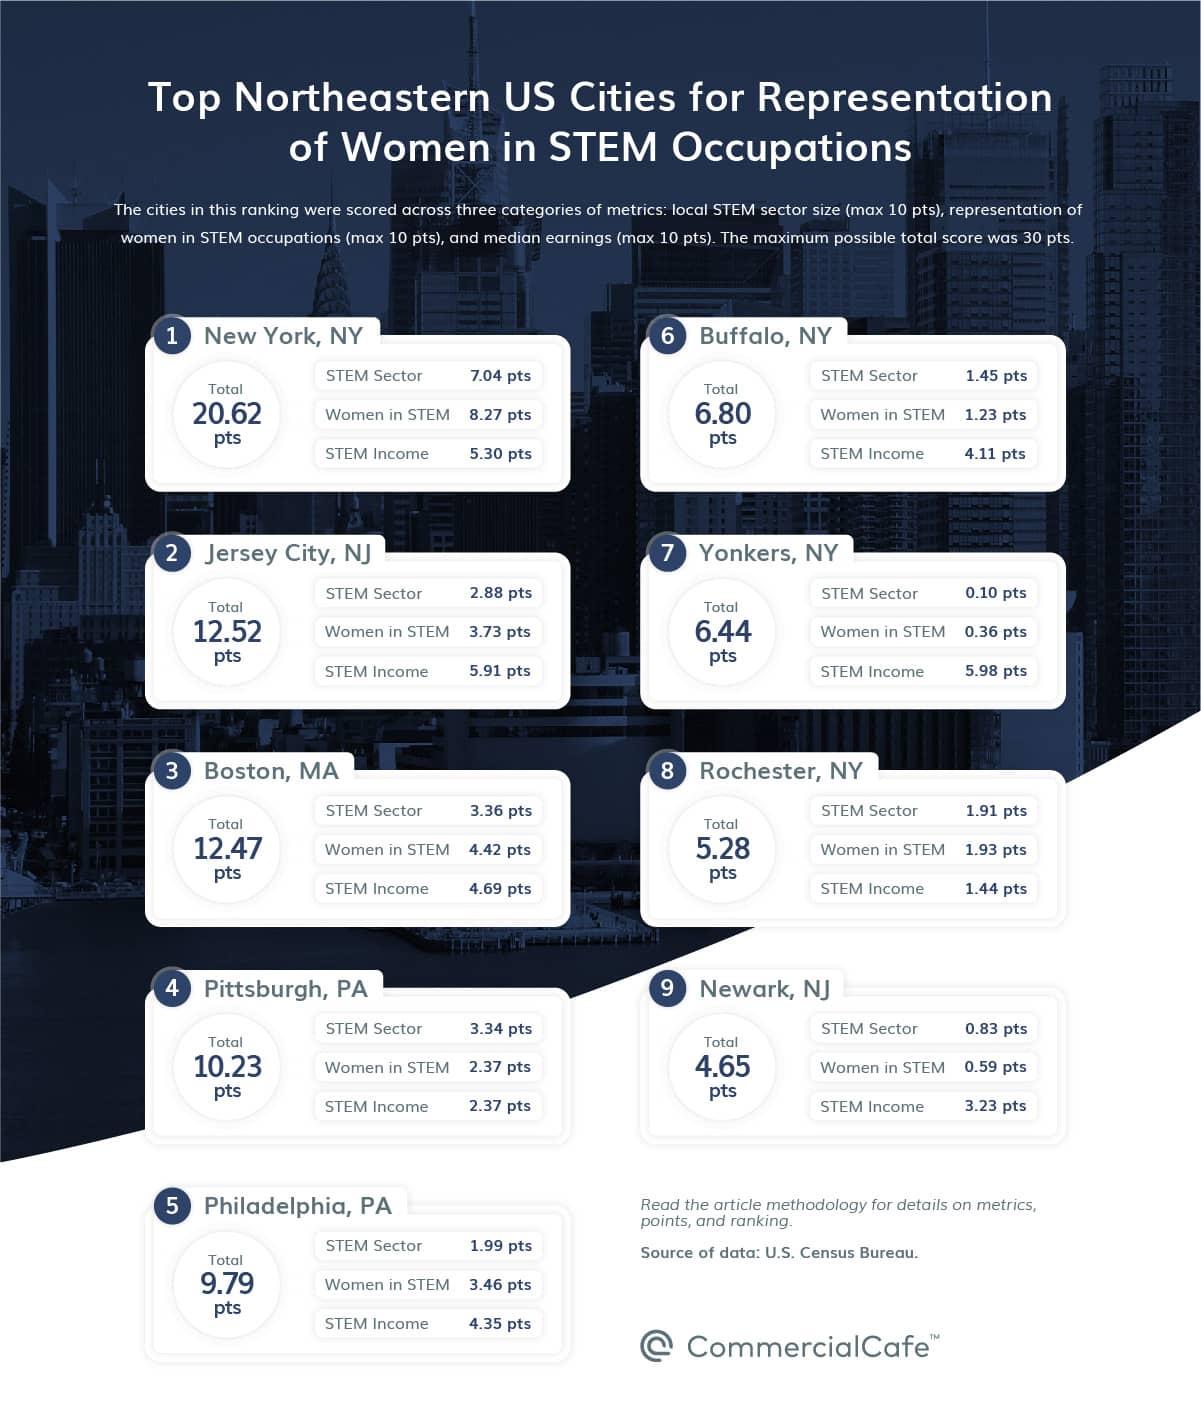 top 10 top northeast us cities by representation of women in stem 2021